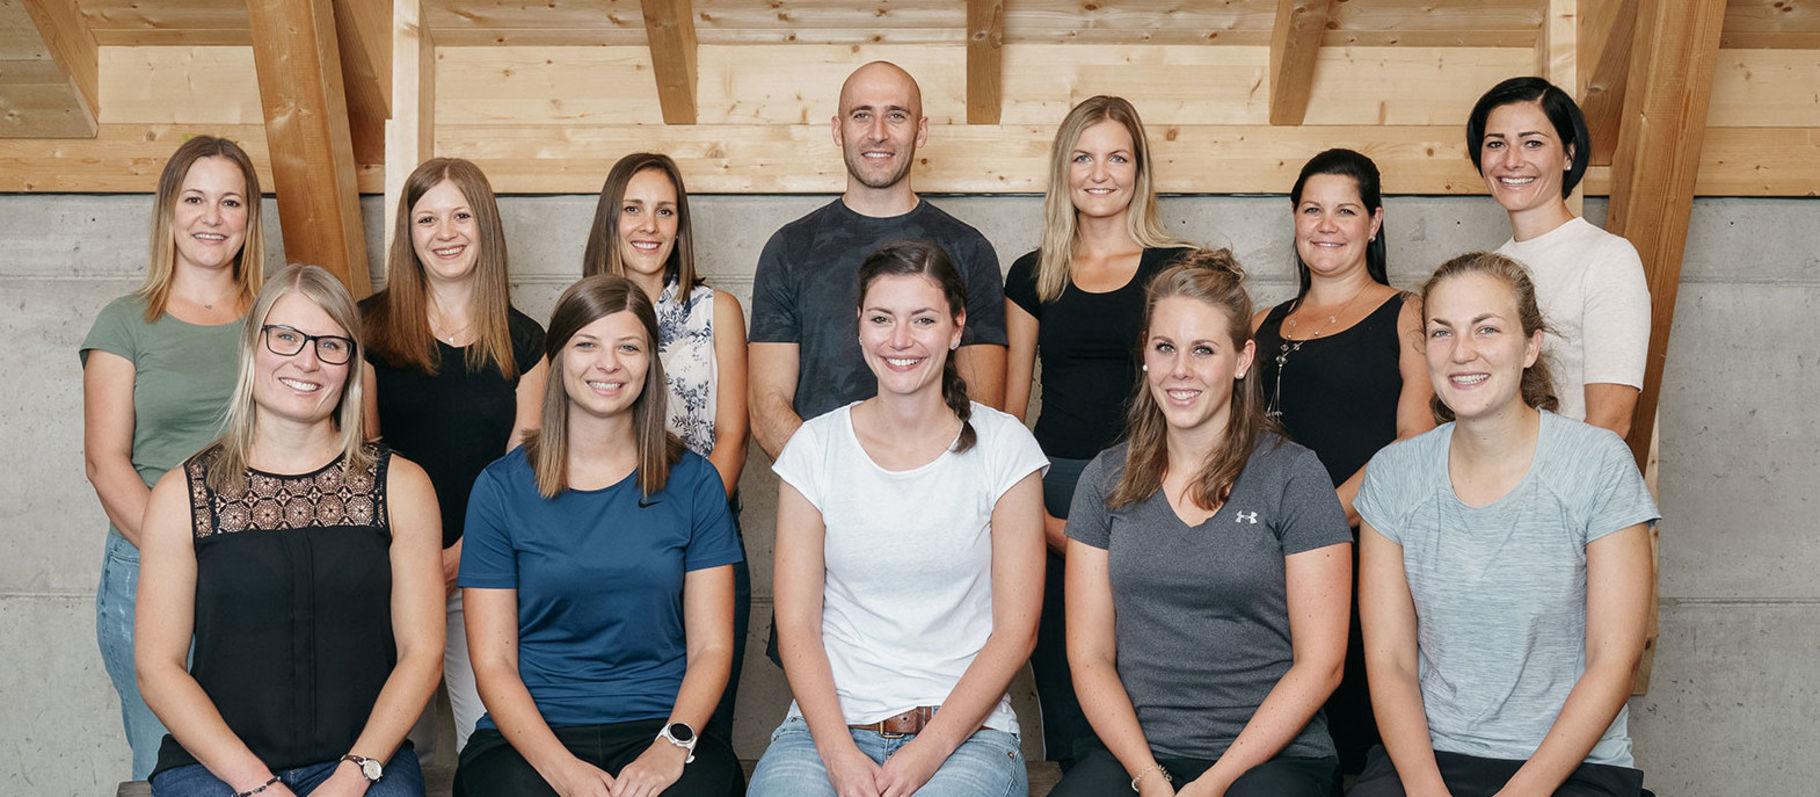 Das team des Therapiezentrum Radl